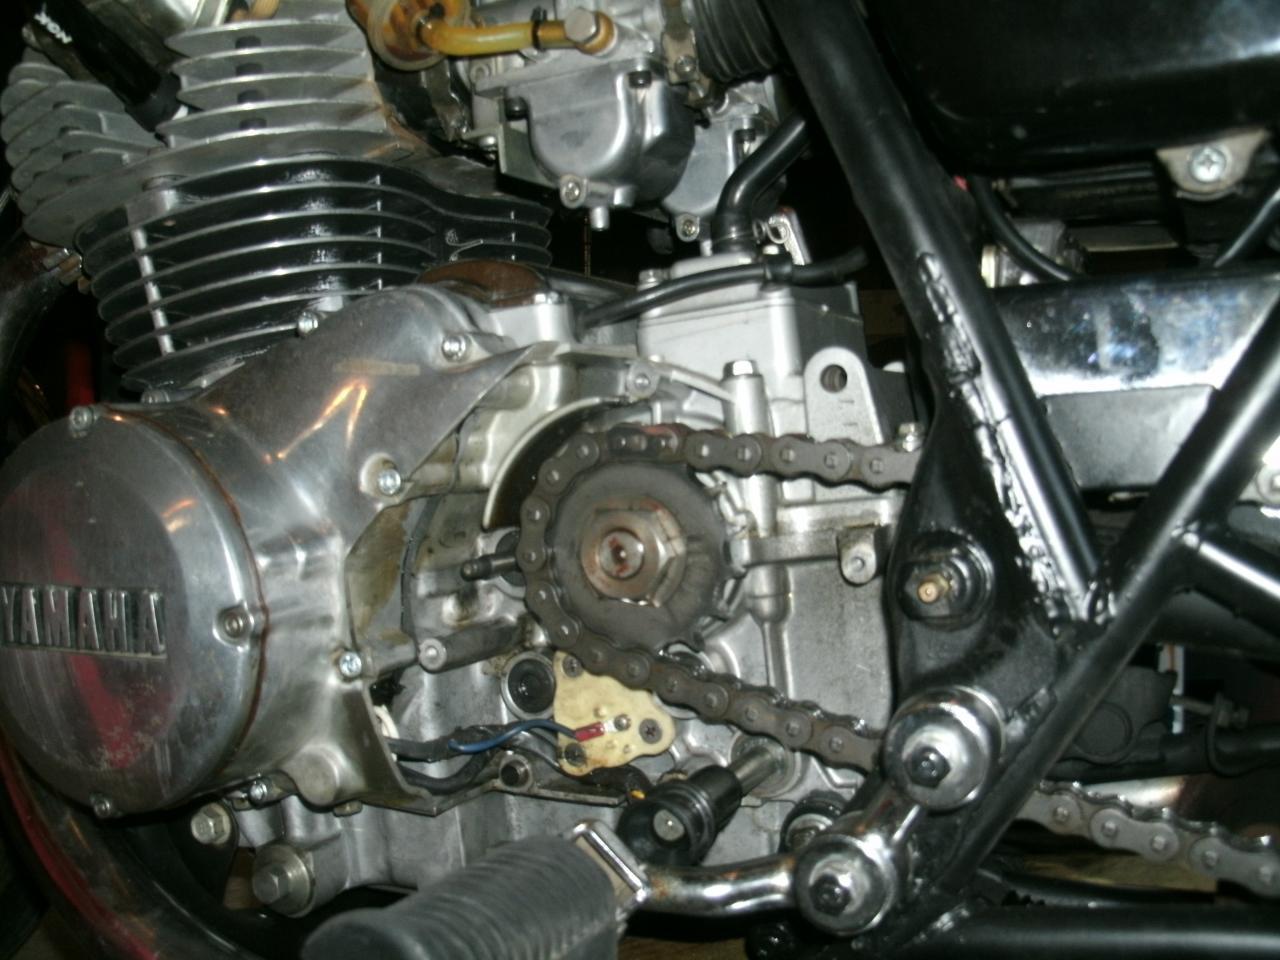 Yamaha Xs Wiring Diagram Oil Leak From Clutch Rod Seal Yamaha Xs400 Forum